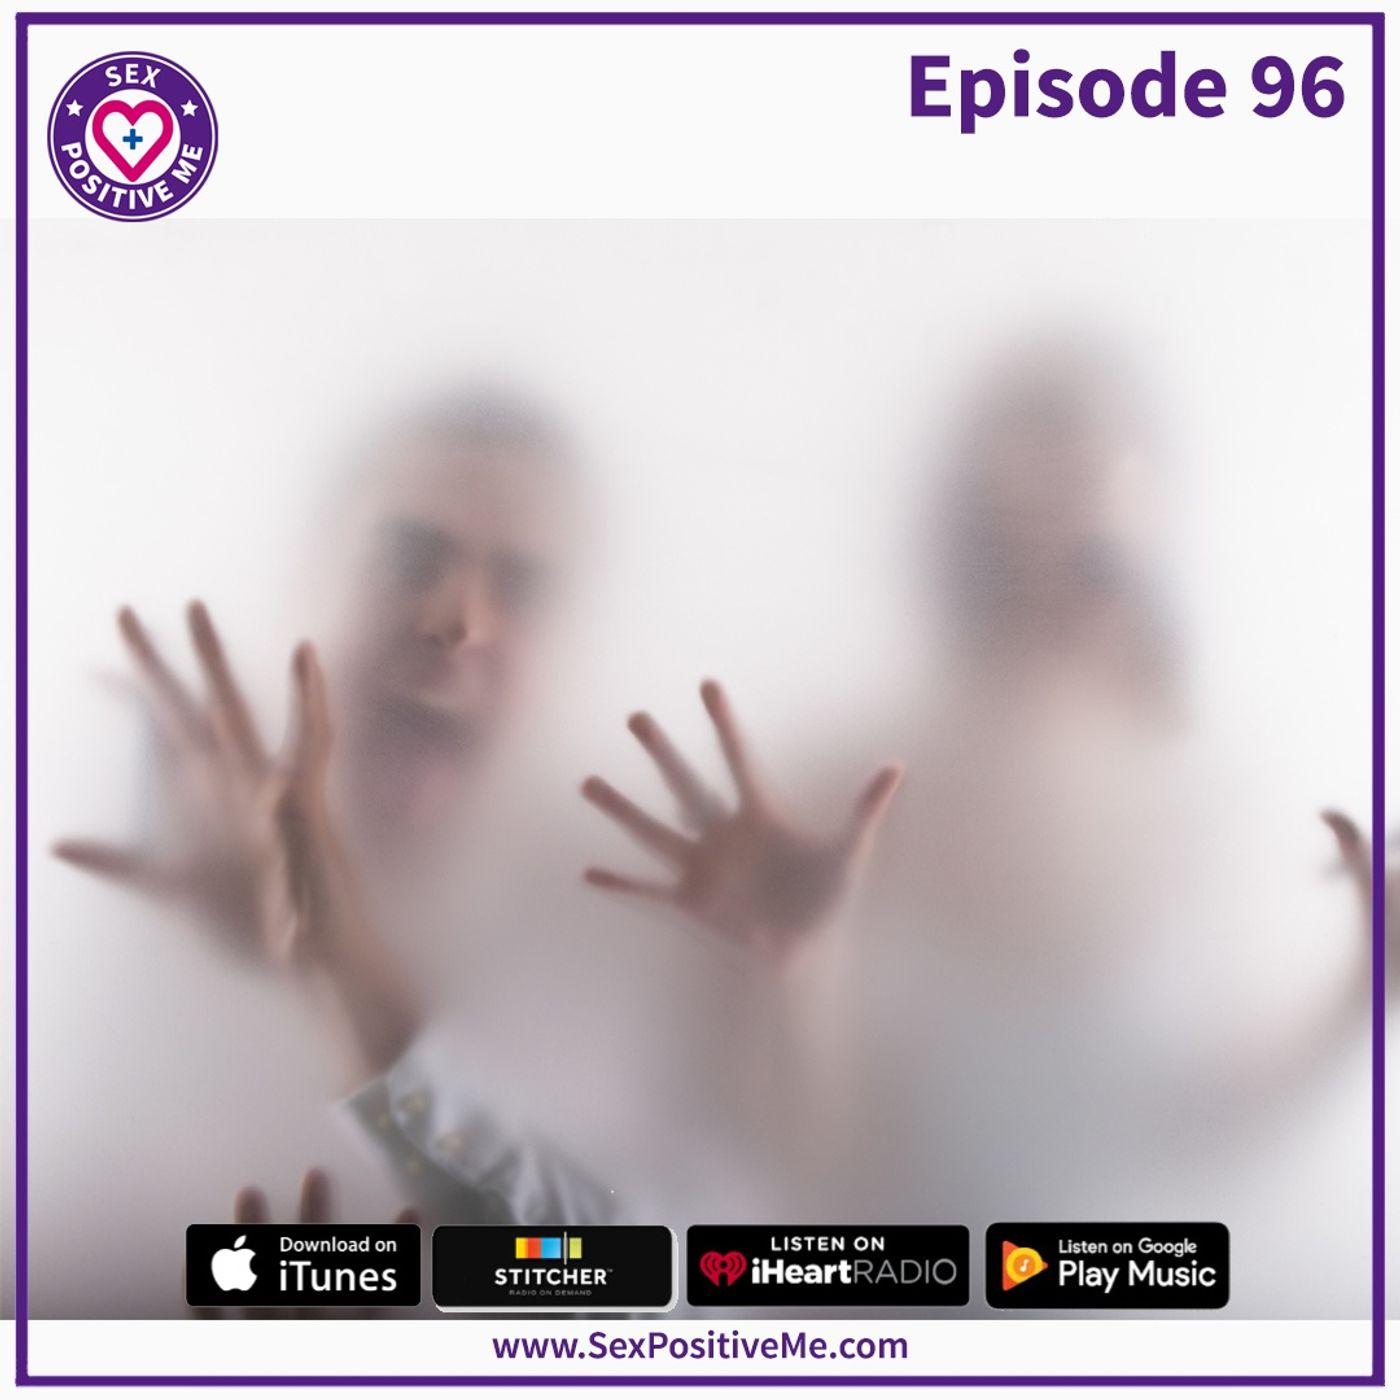 Sex Positive Me - E96: Consensual Confinement